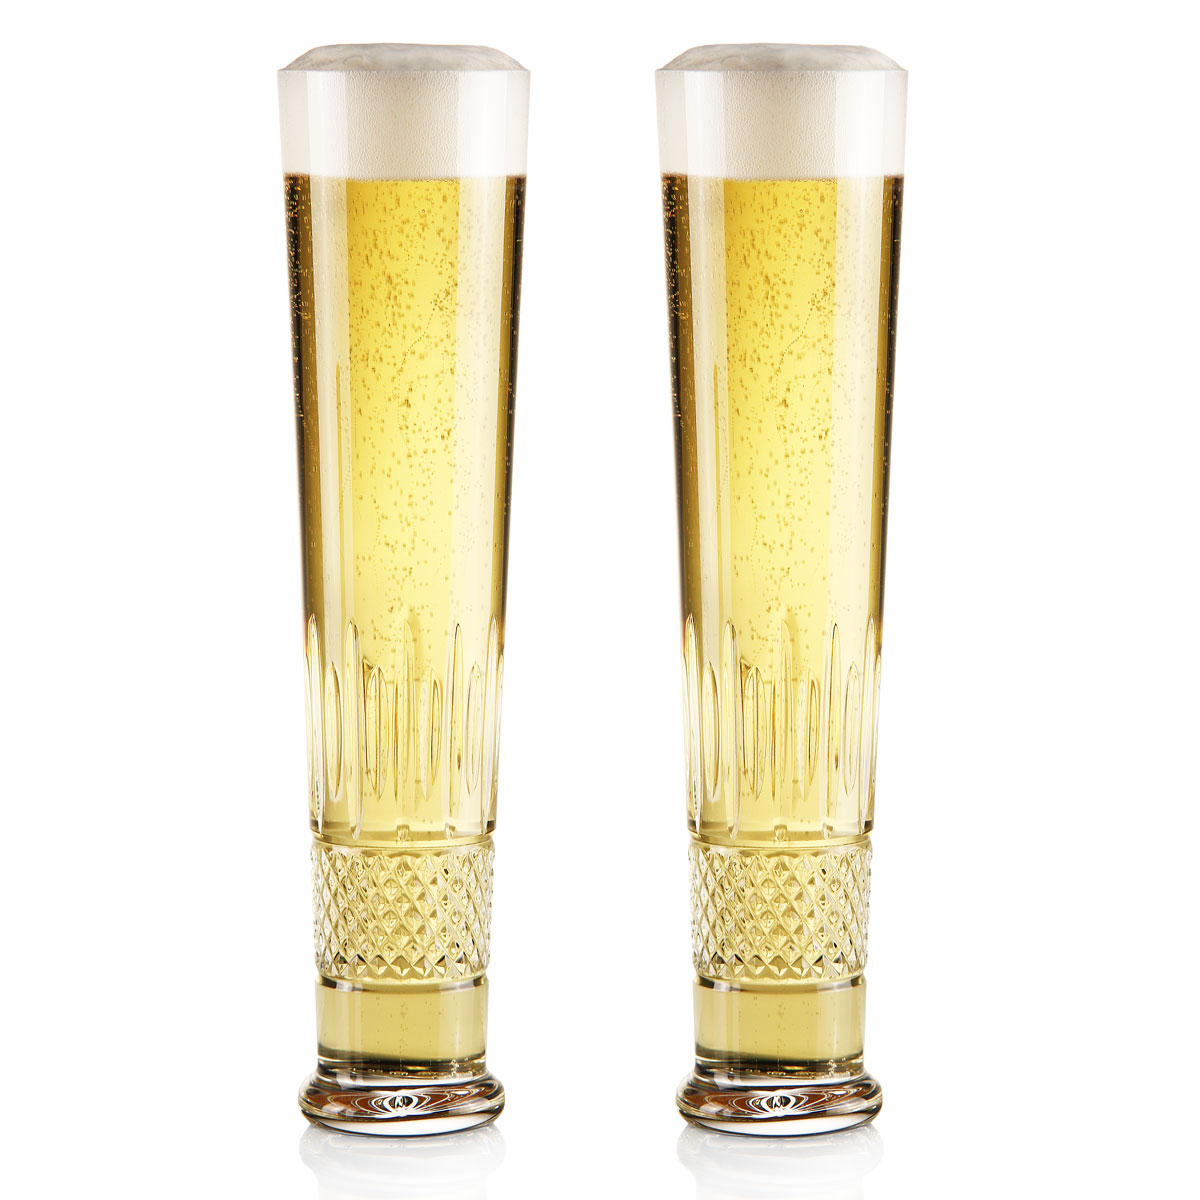 Cashs Ireland, Cooper Lager, Pilsner Beer Glass 1+1 Free